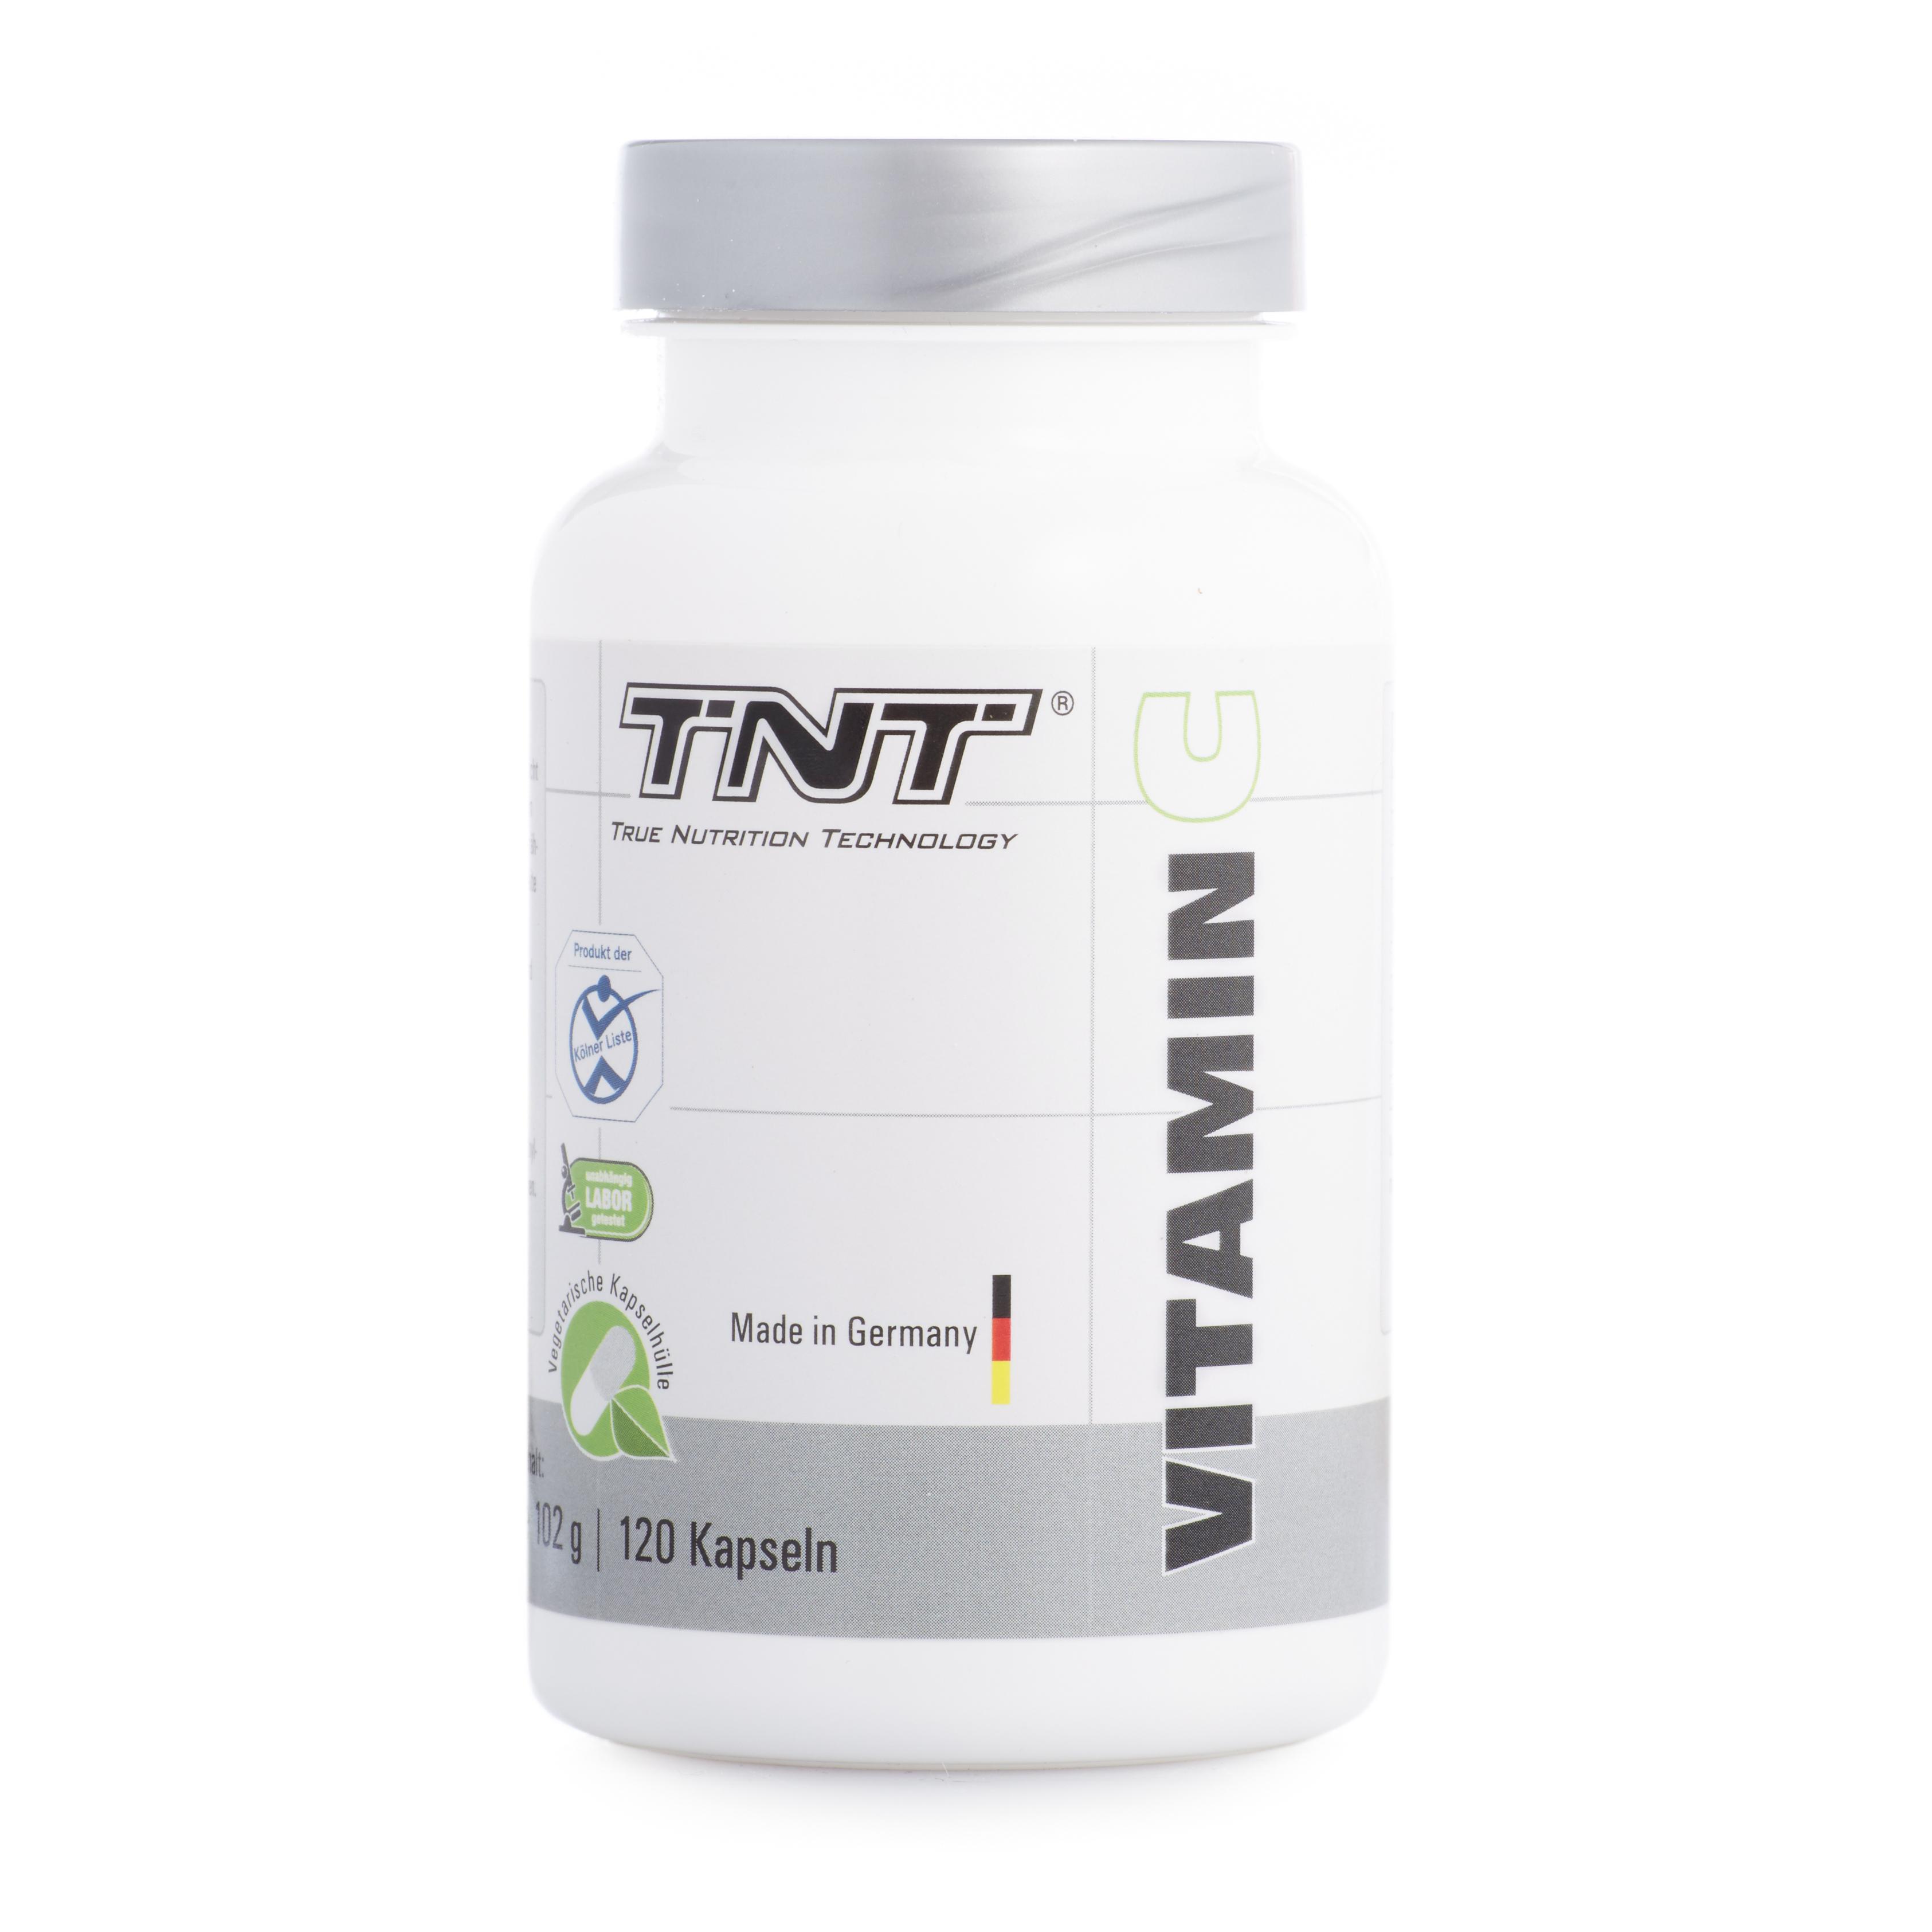 TNT Vitamin C - 120 Kapseln